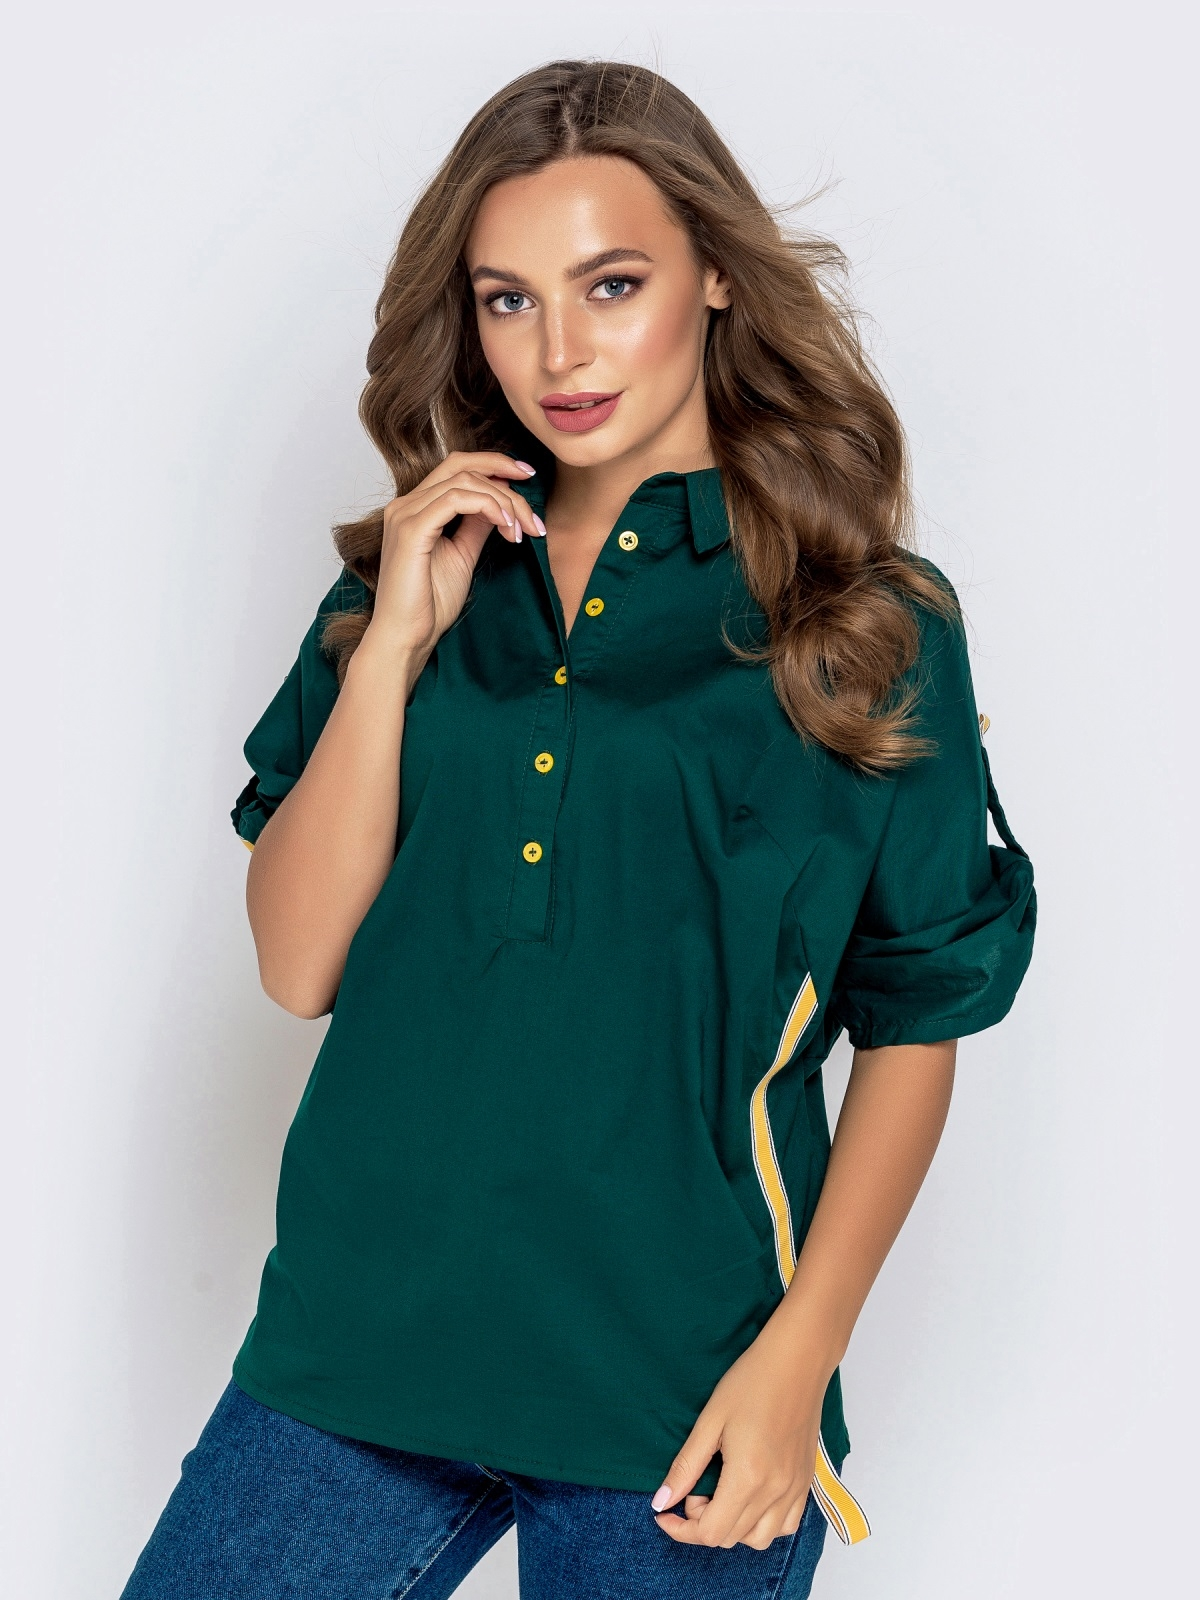 Зеленая рубашка со шлевками на рукавах 40832, фото 1